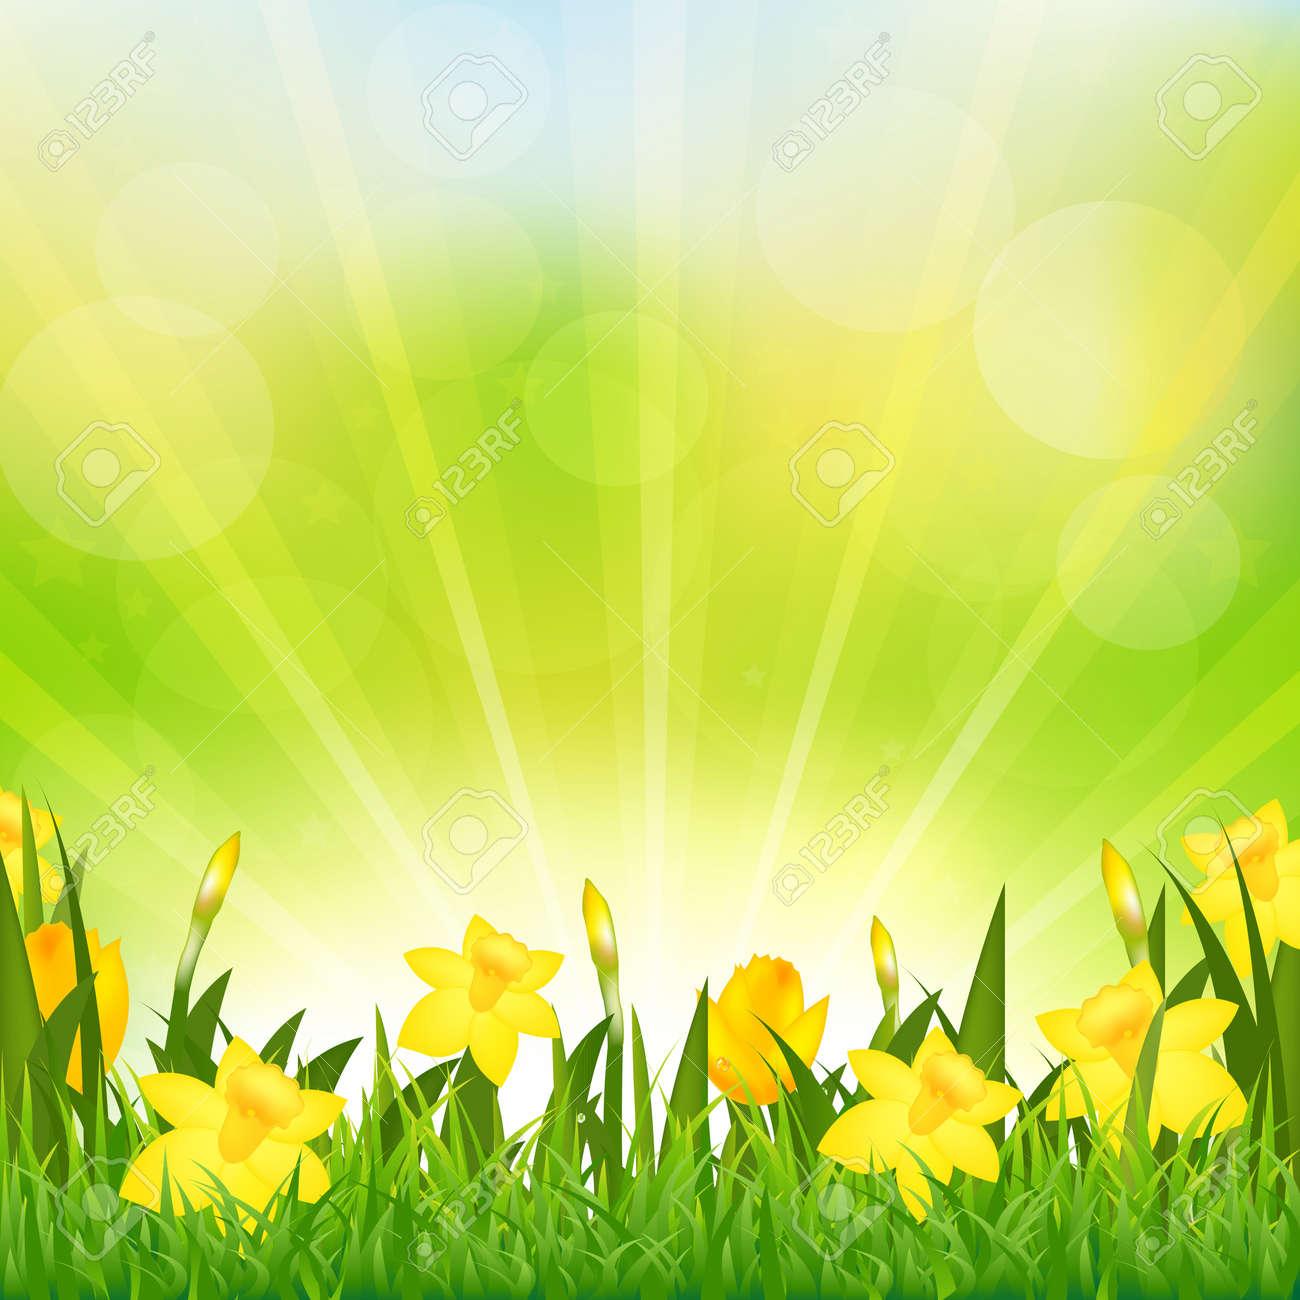 Flowers Easter Background Stock Vector - 12487205